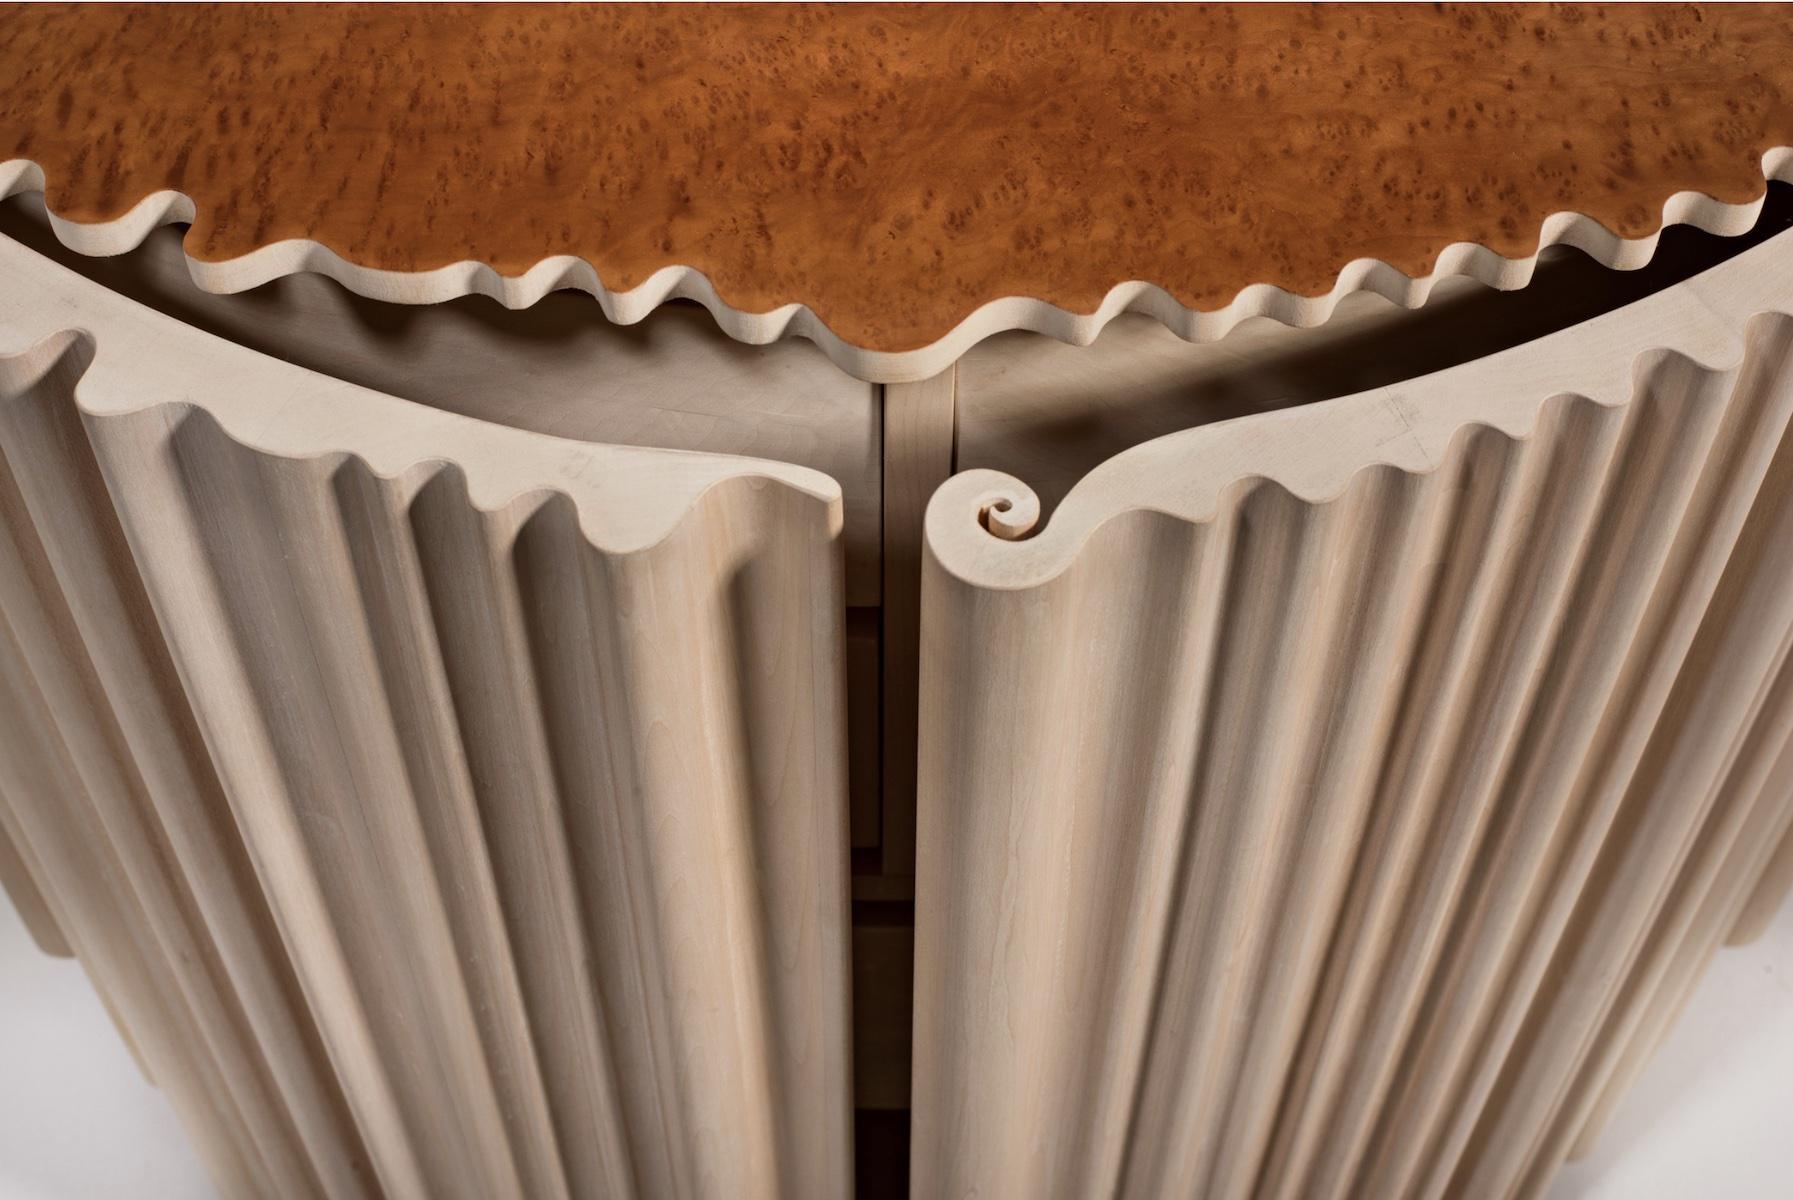 door detail of the Pearl Cabinet by artist Christopher Kurtz